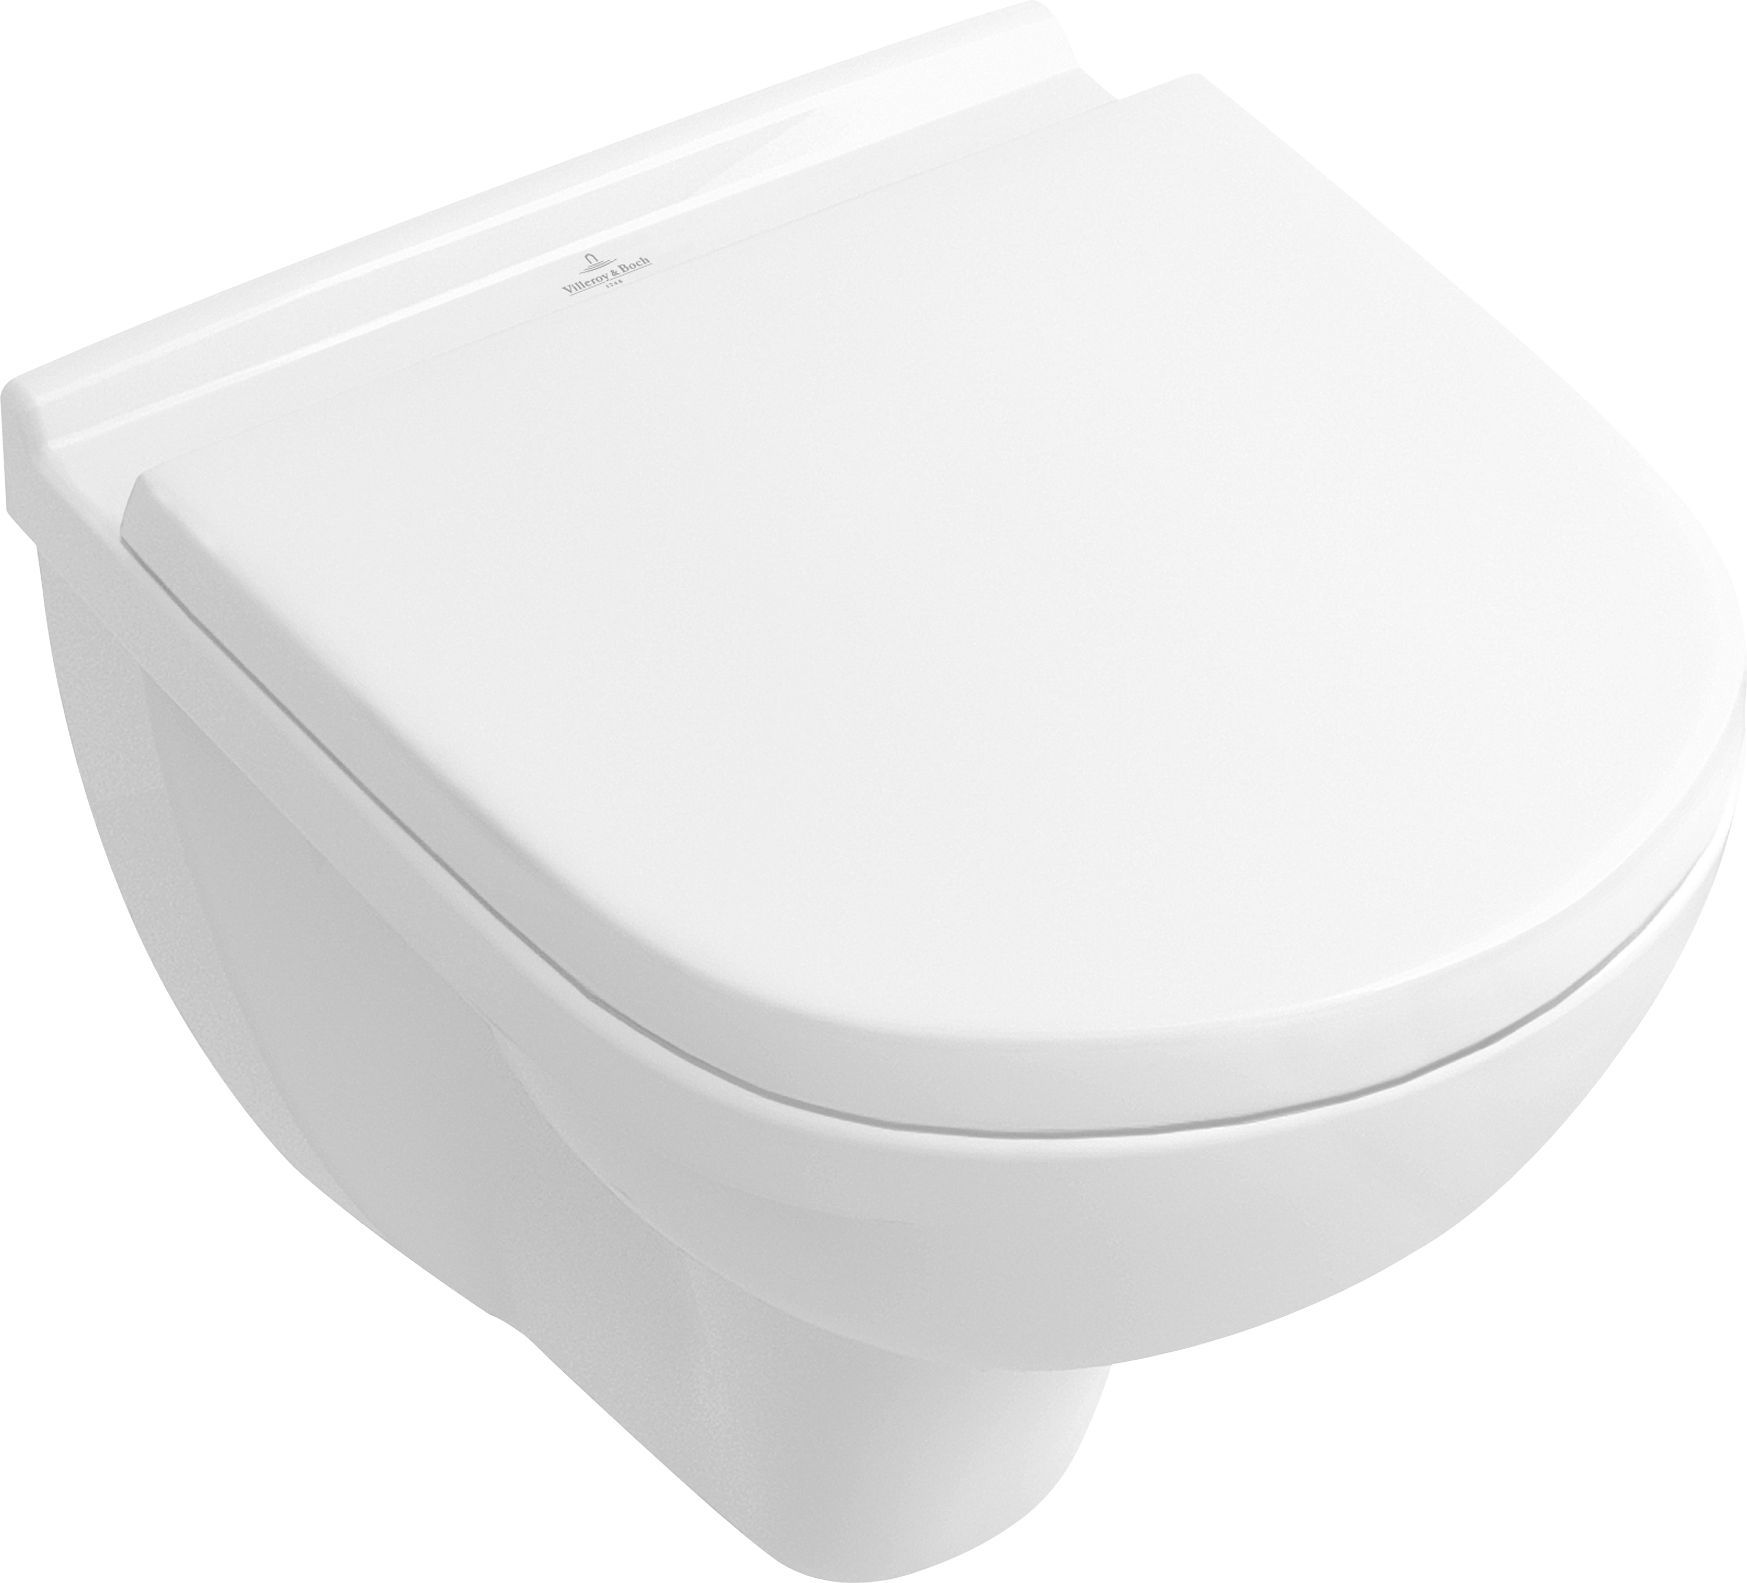 Villeroy & Boch O.novo Combi-Pack mit Tiefspül-Wand-WC Compact L:49xB:36cm weiß mit CeramicPlus mit WC-Sitz mit Absenkautomatik 5688H1R1